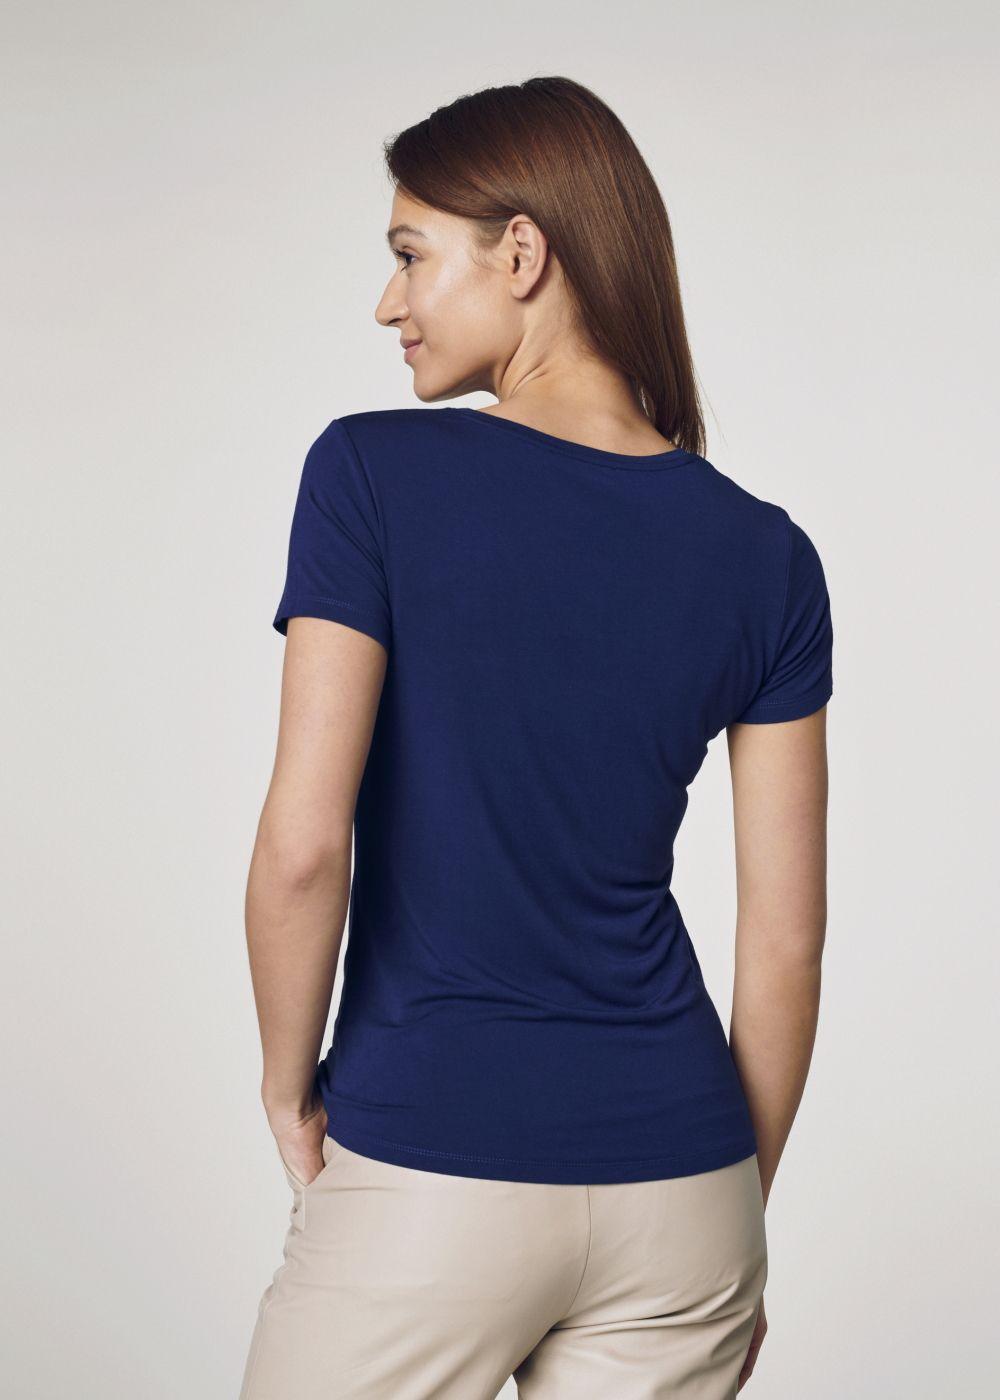 T-shirt damski TSHDT-0069-69(W21)